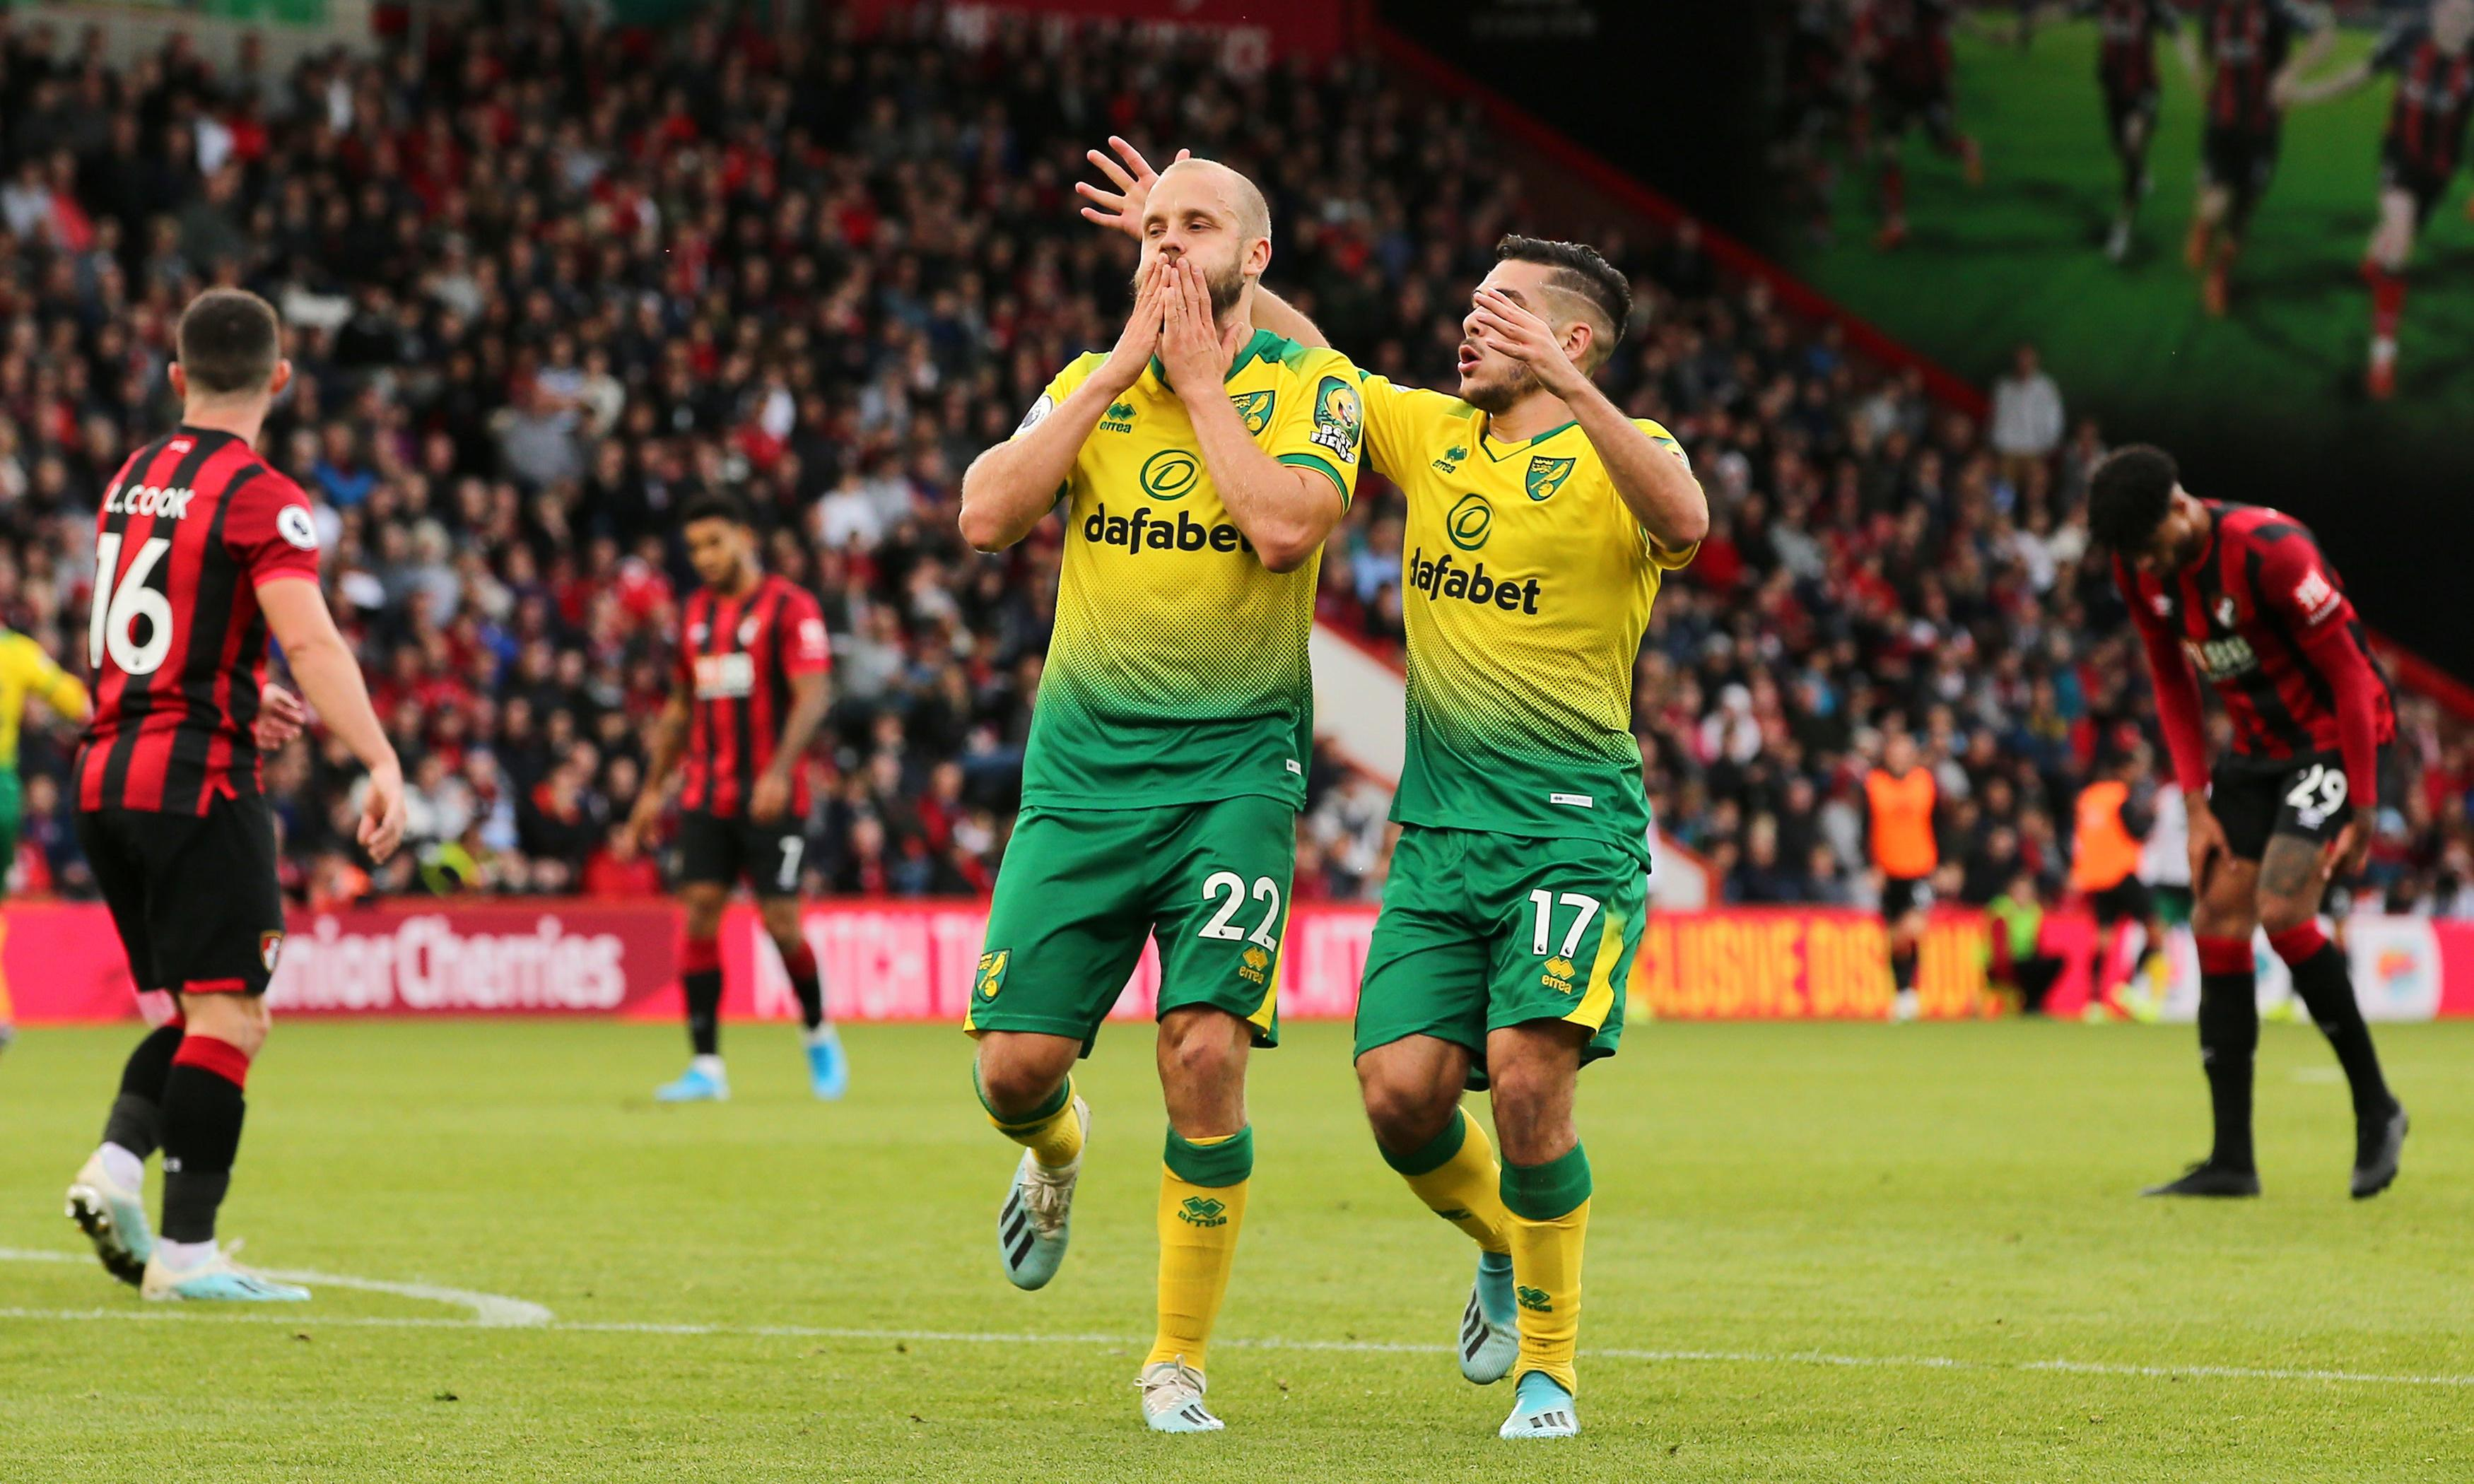 Norwich's Tim Krul denies Solanke and Danjuma to frustrate Bournemouth